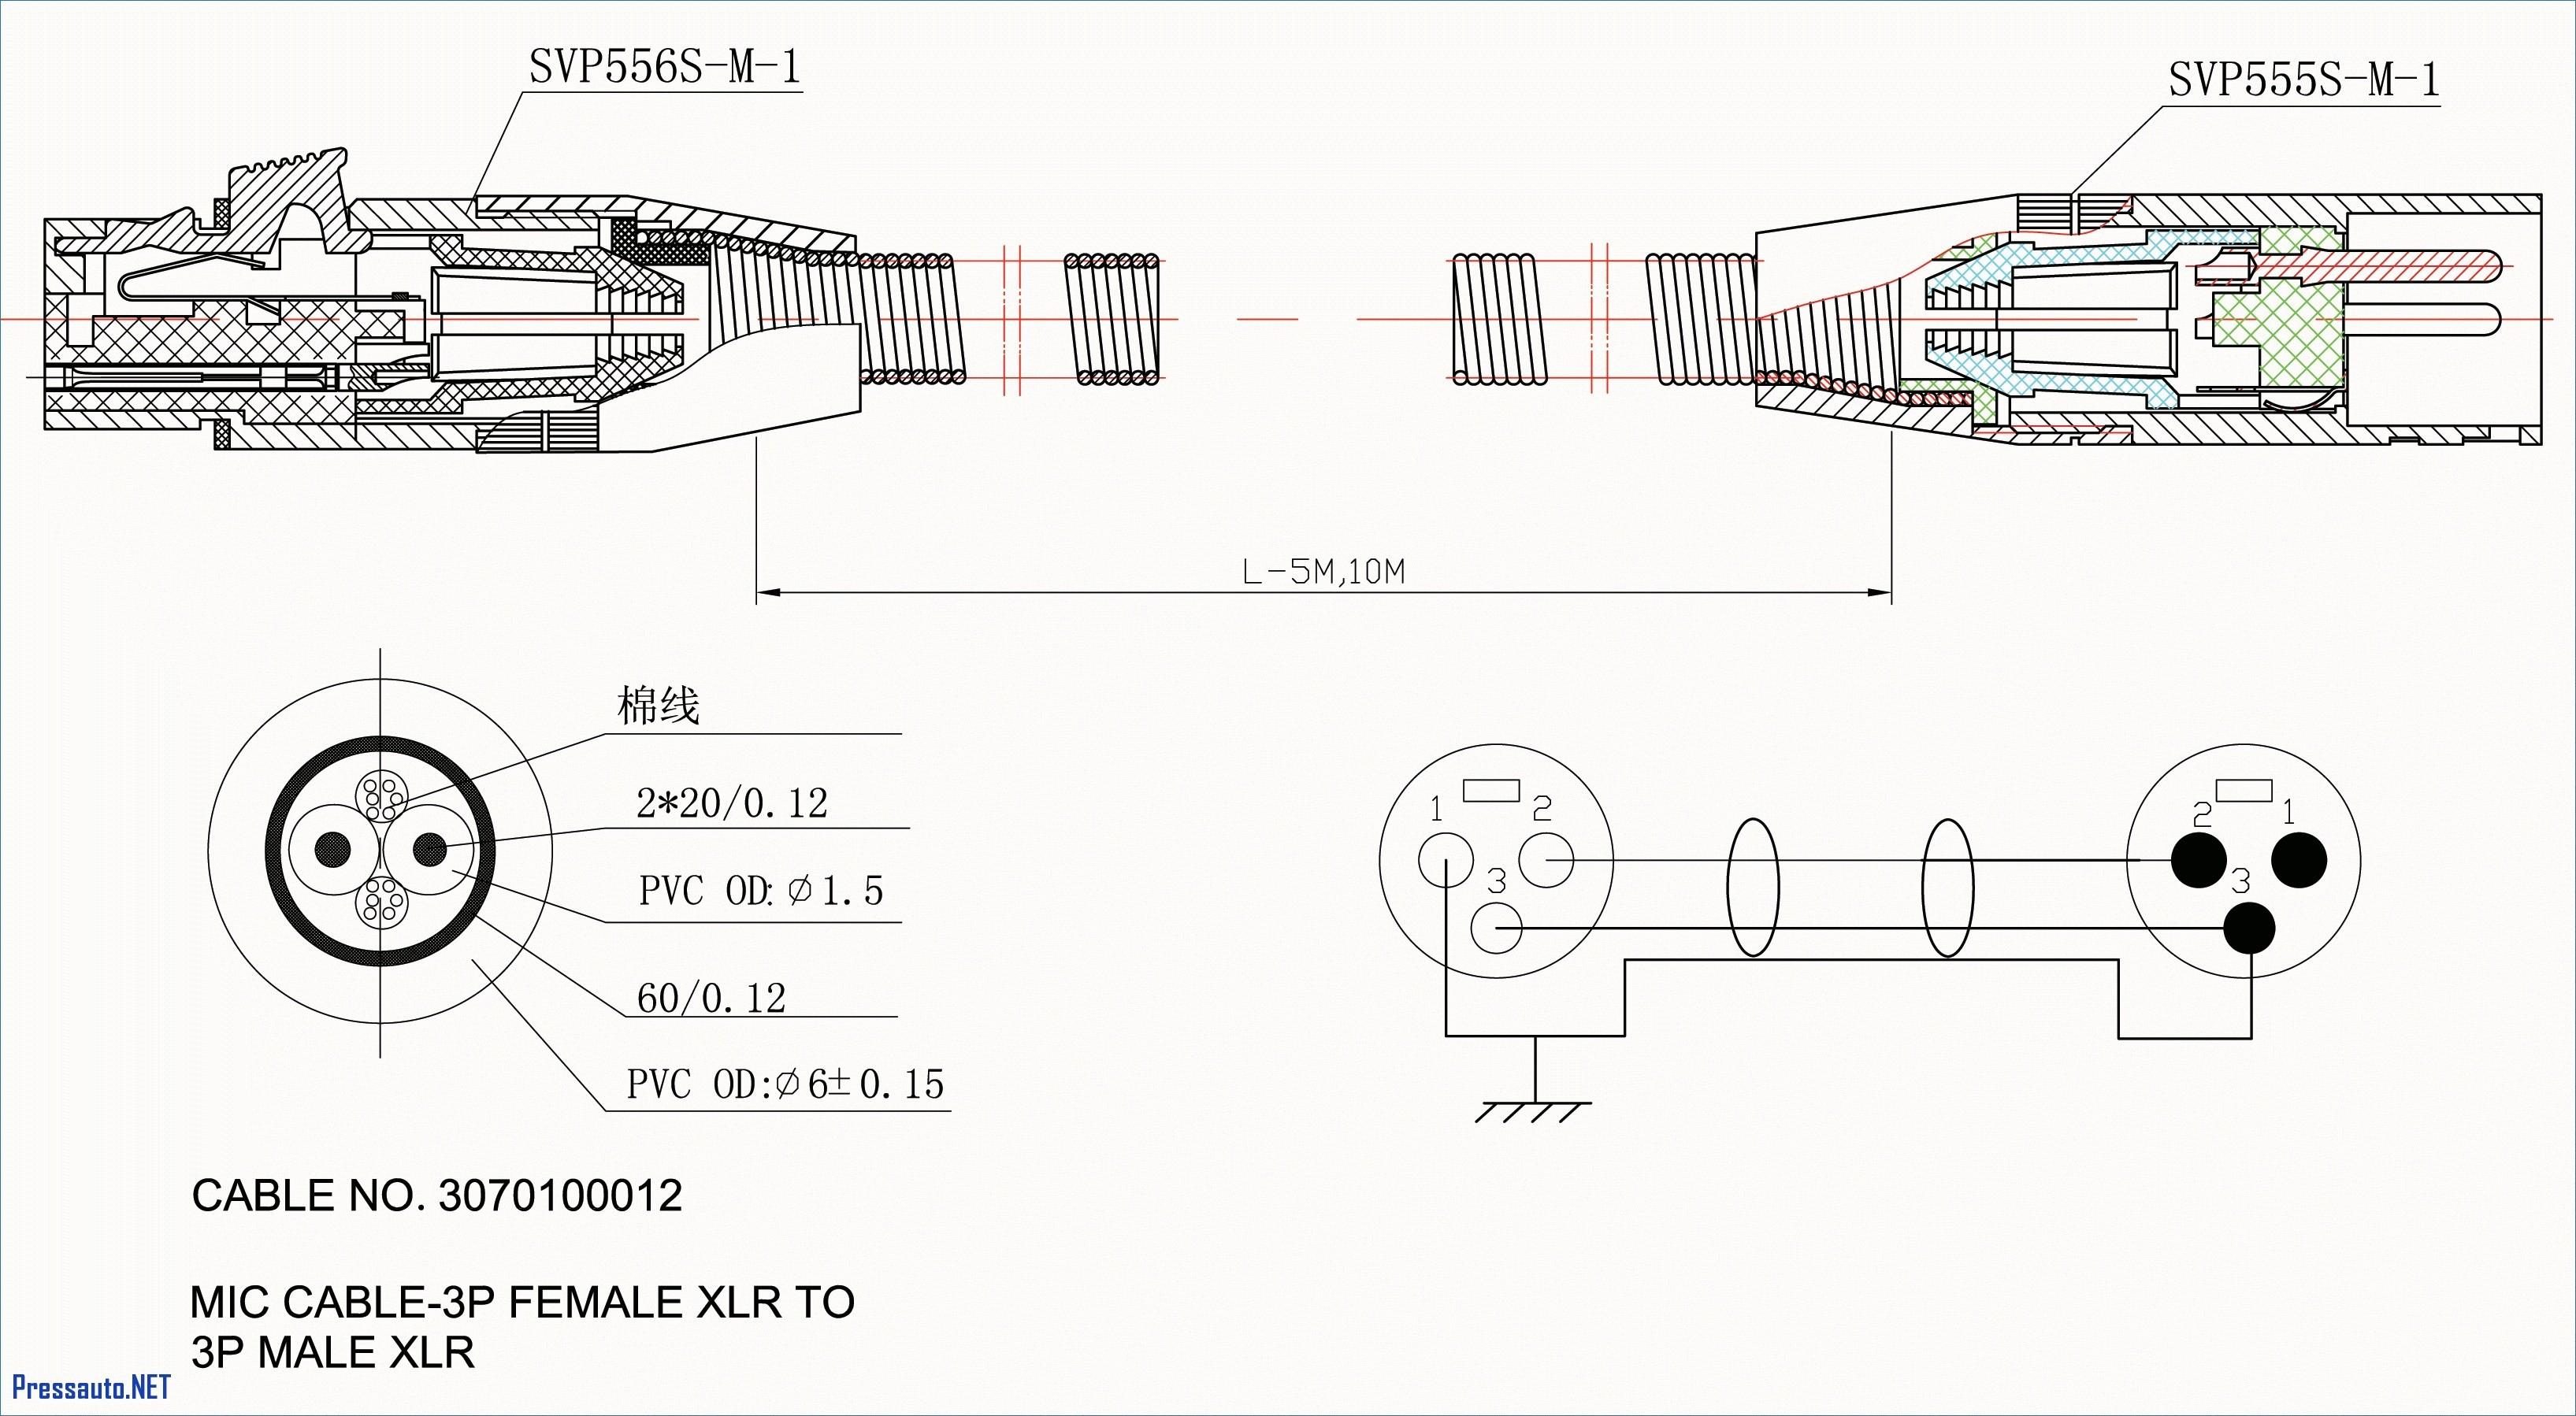 7 Wire Trailer Plug Diagram 7 Pin Trailer Wiring Diagram Of 7 Wire Trailer Plug Diagram